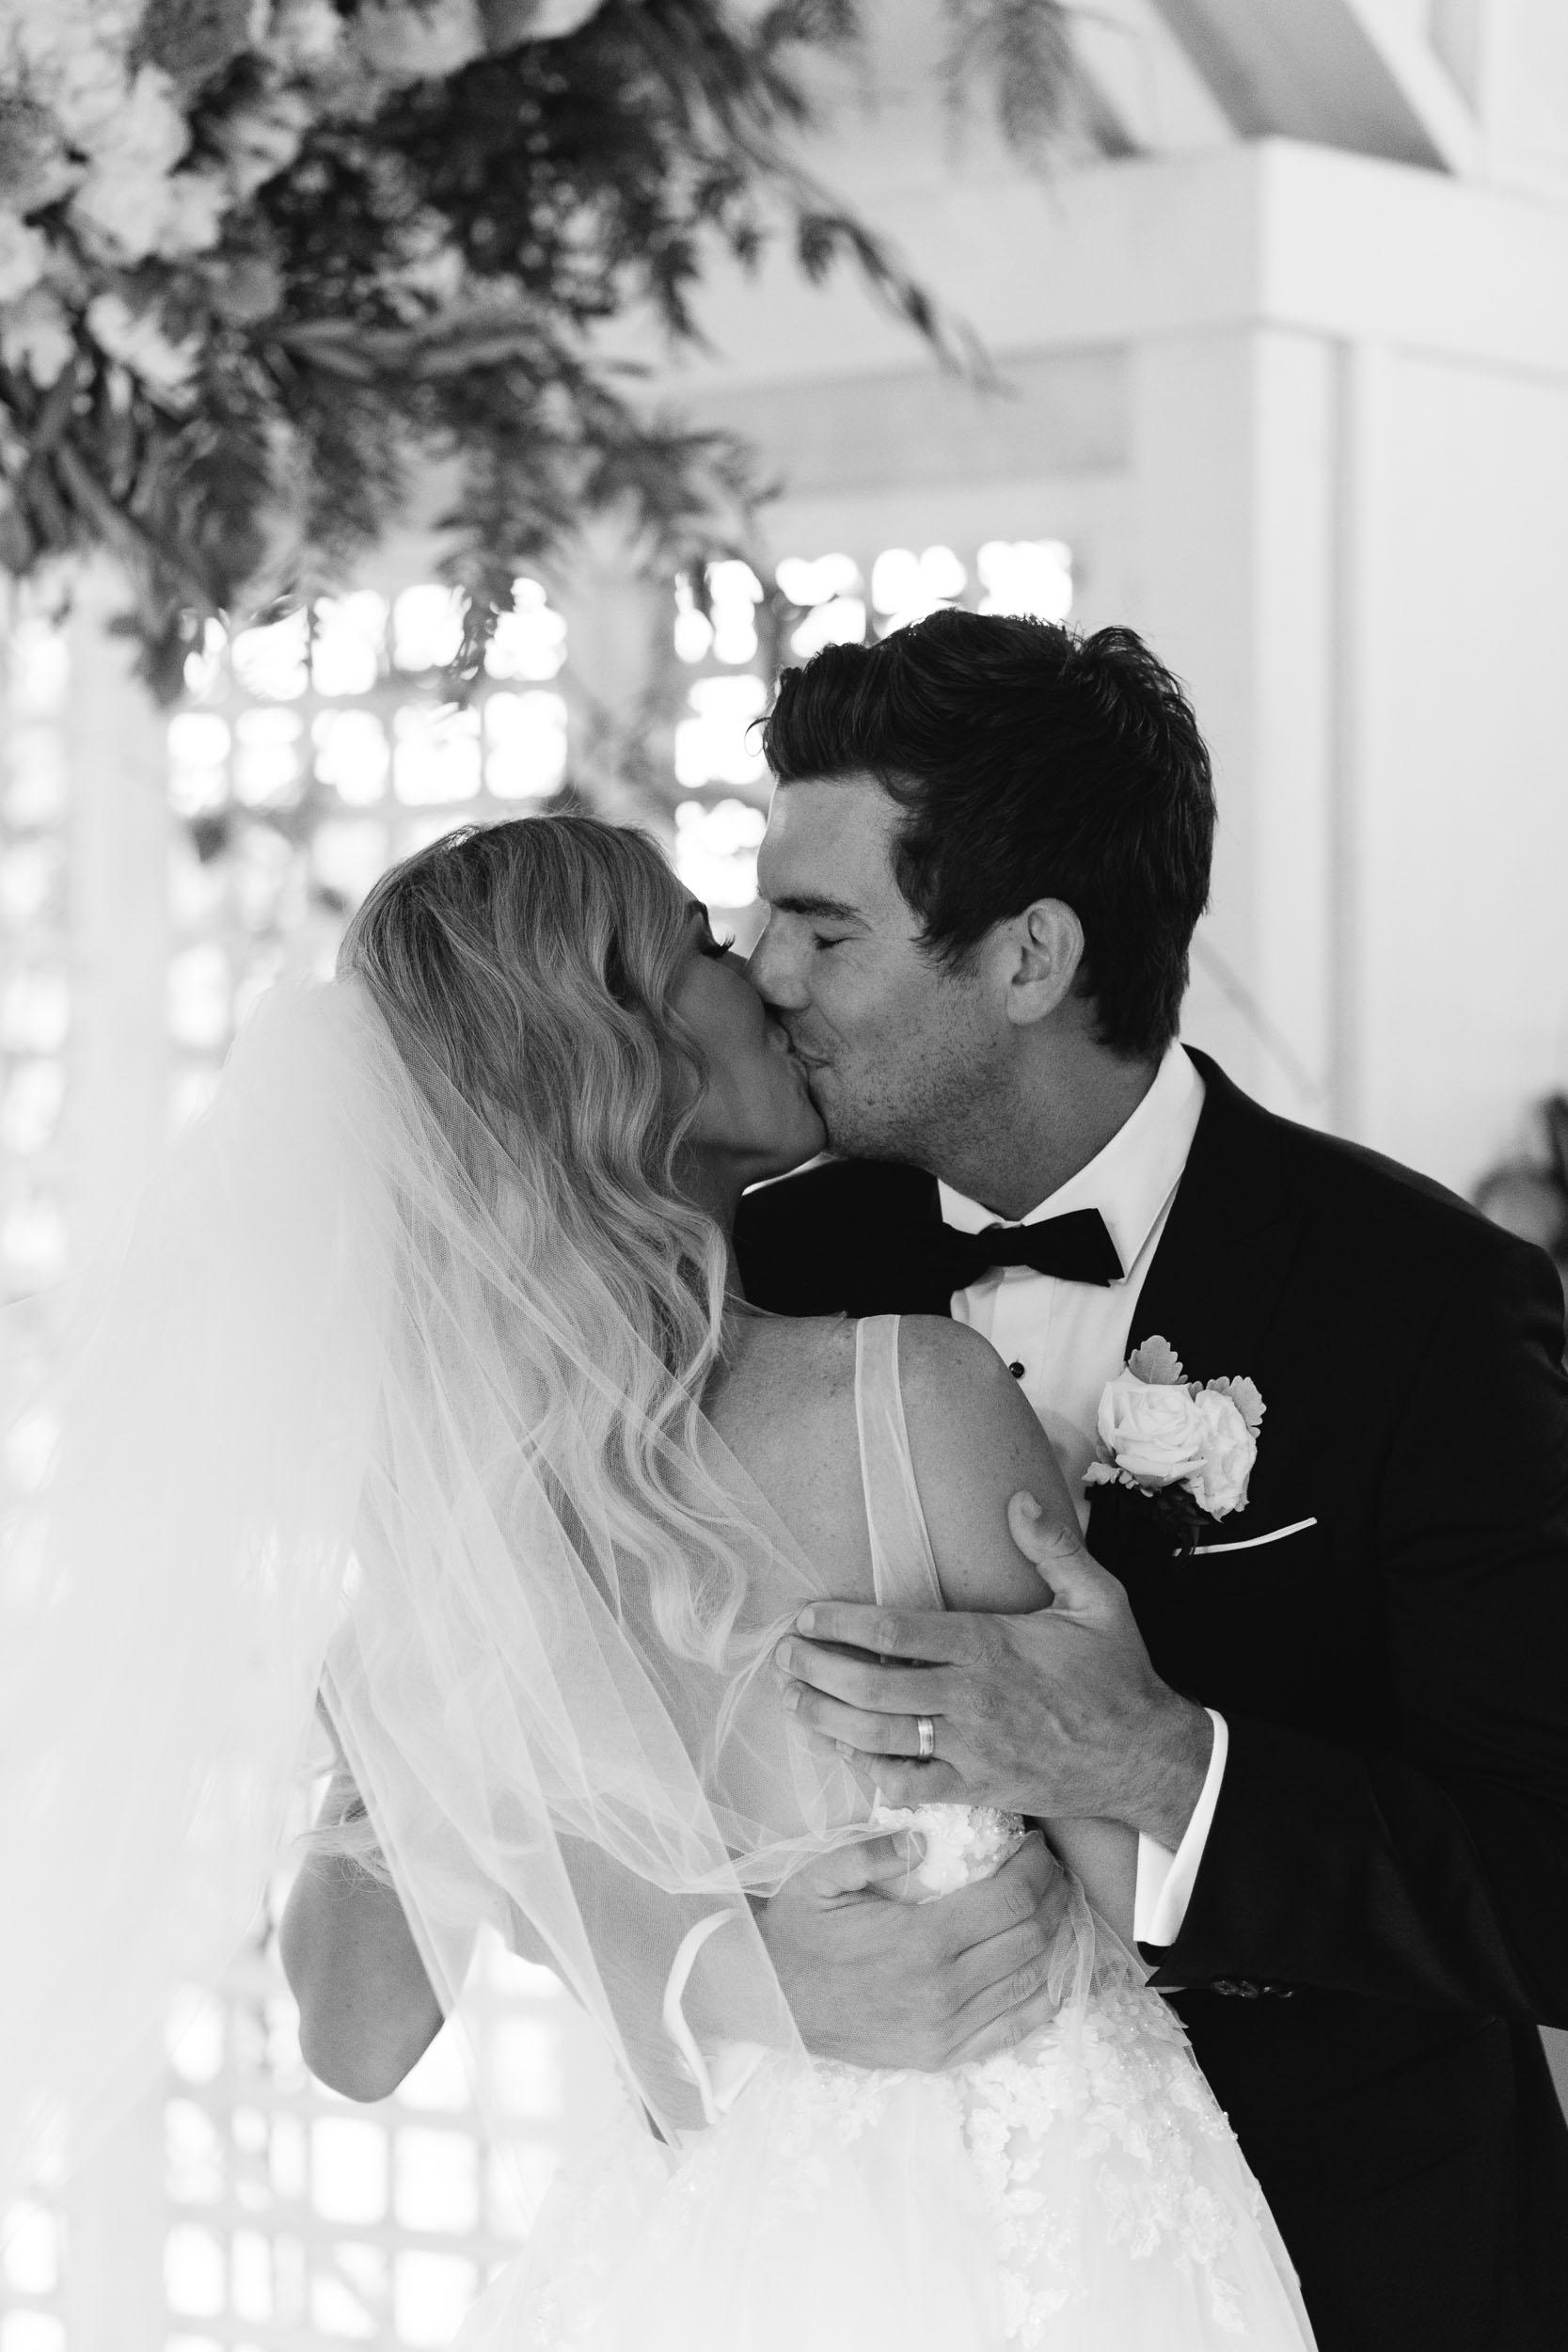 Kas-Richards-Mornington-Peninsula-Private-Property-Wedding-Marianna-Hardwick-Gown-291.jpg